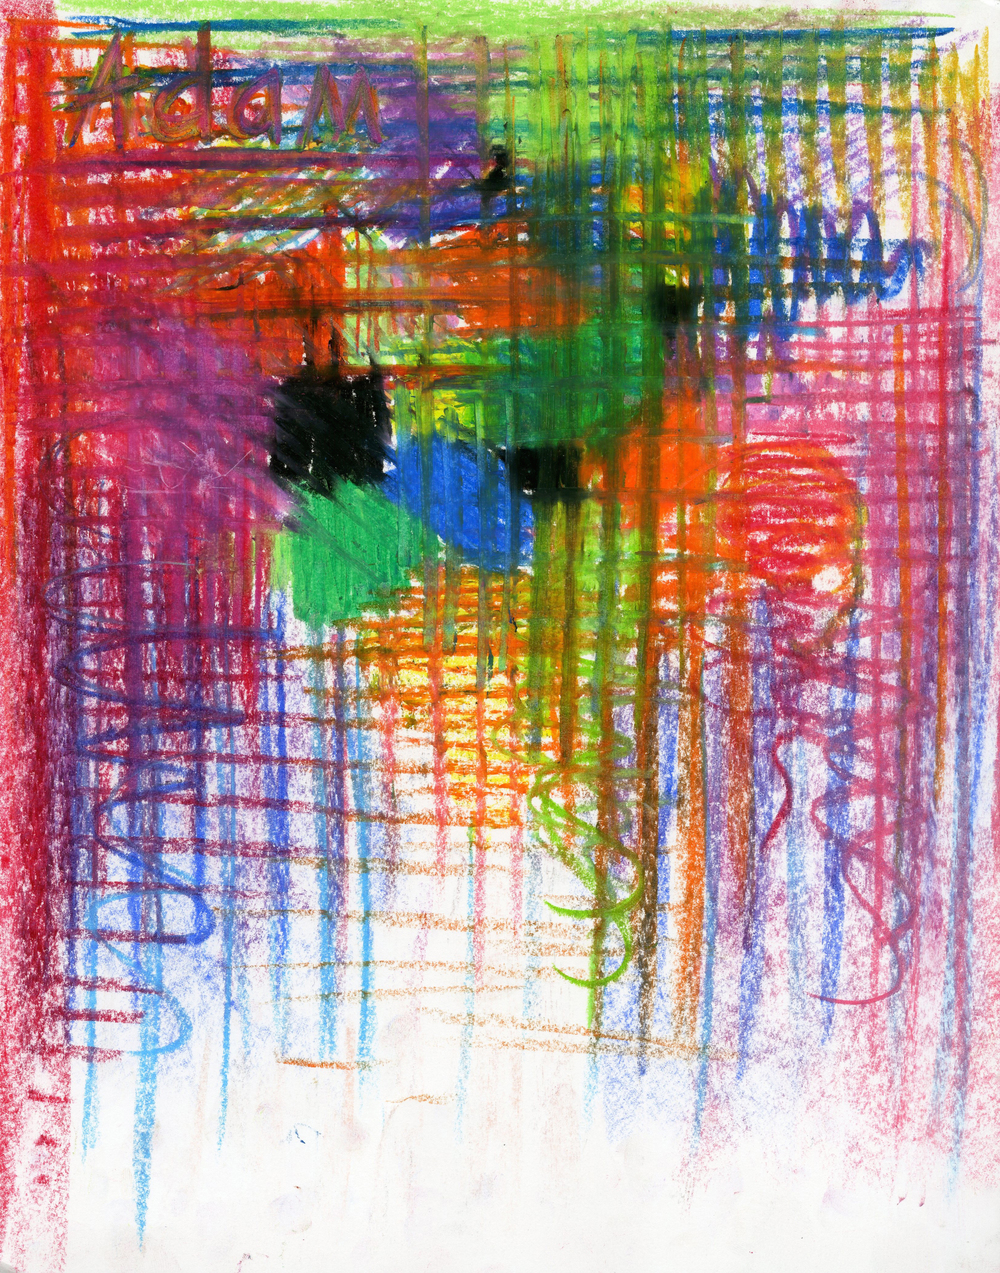 Adam R. - Untitled